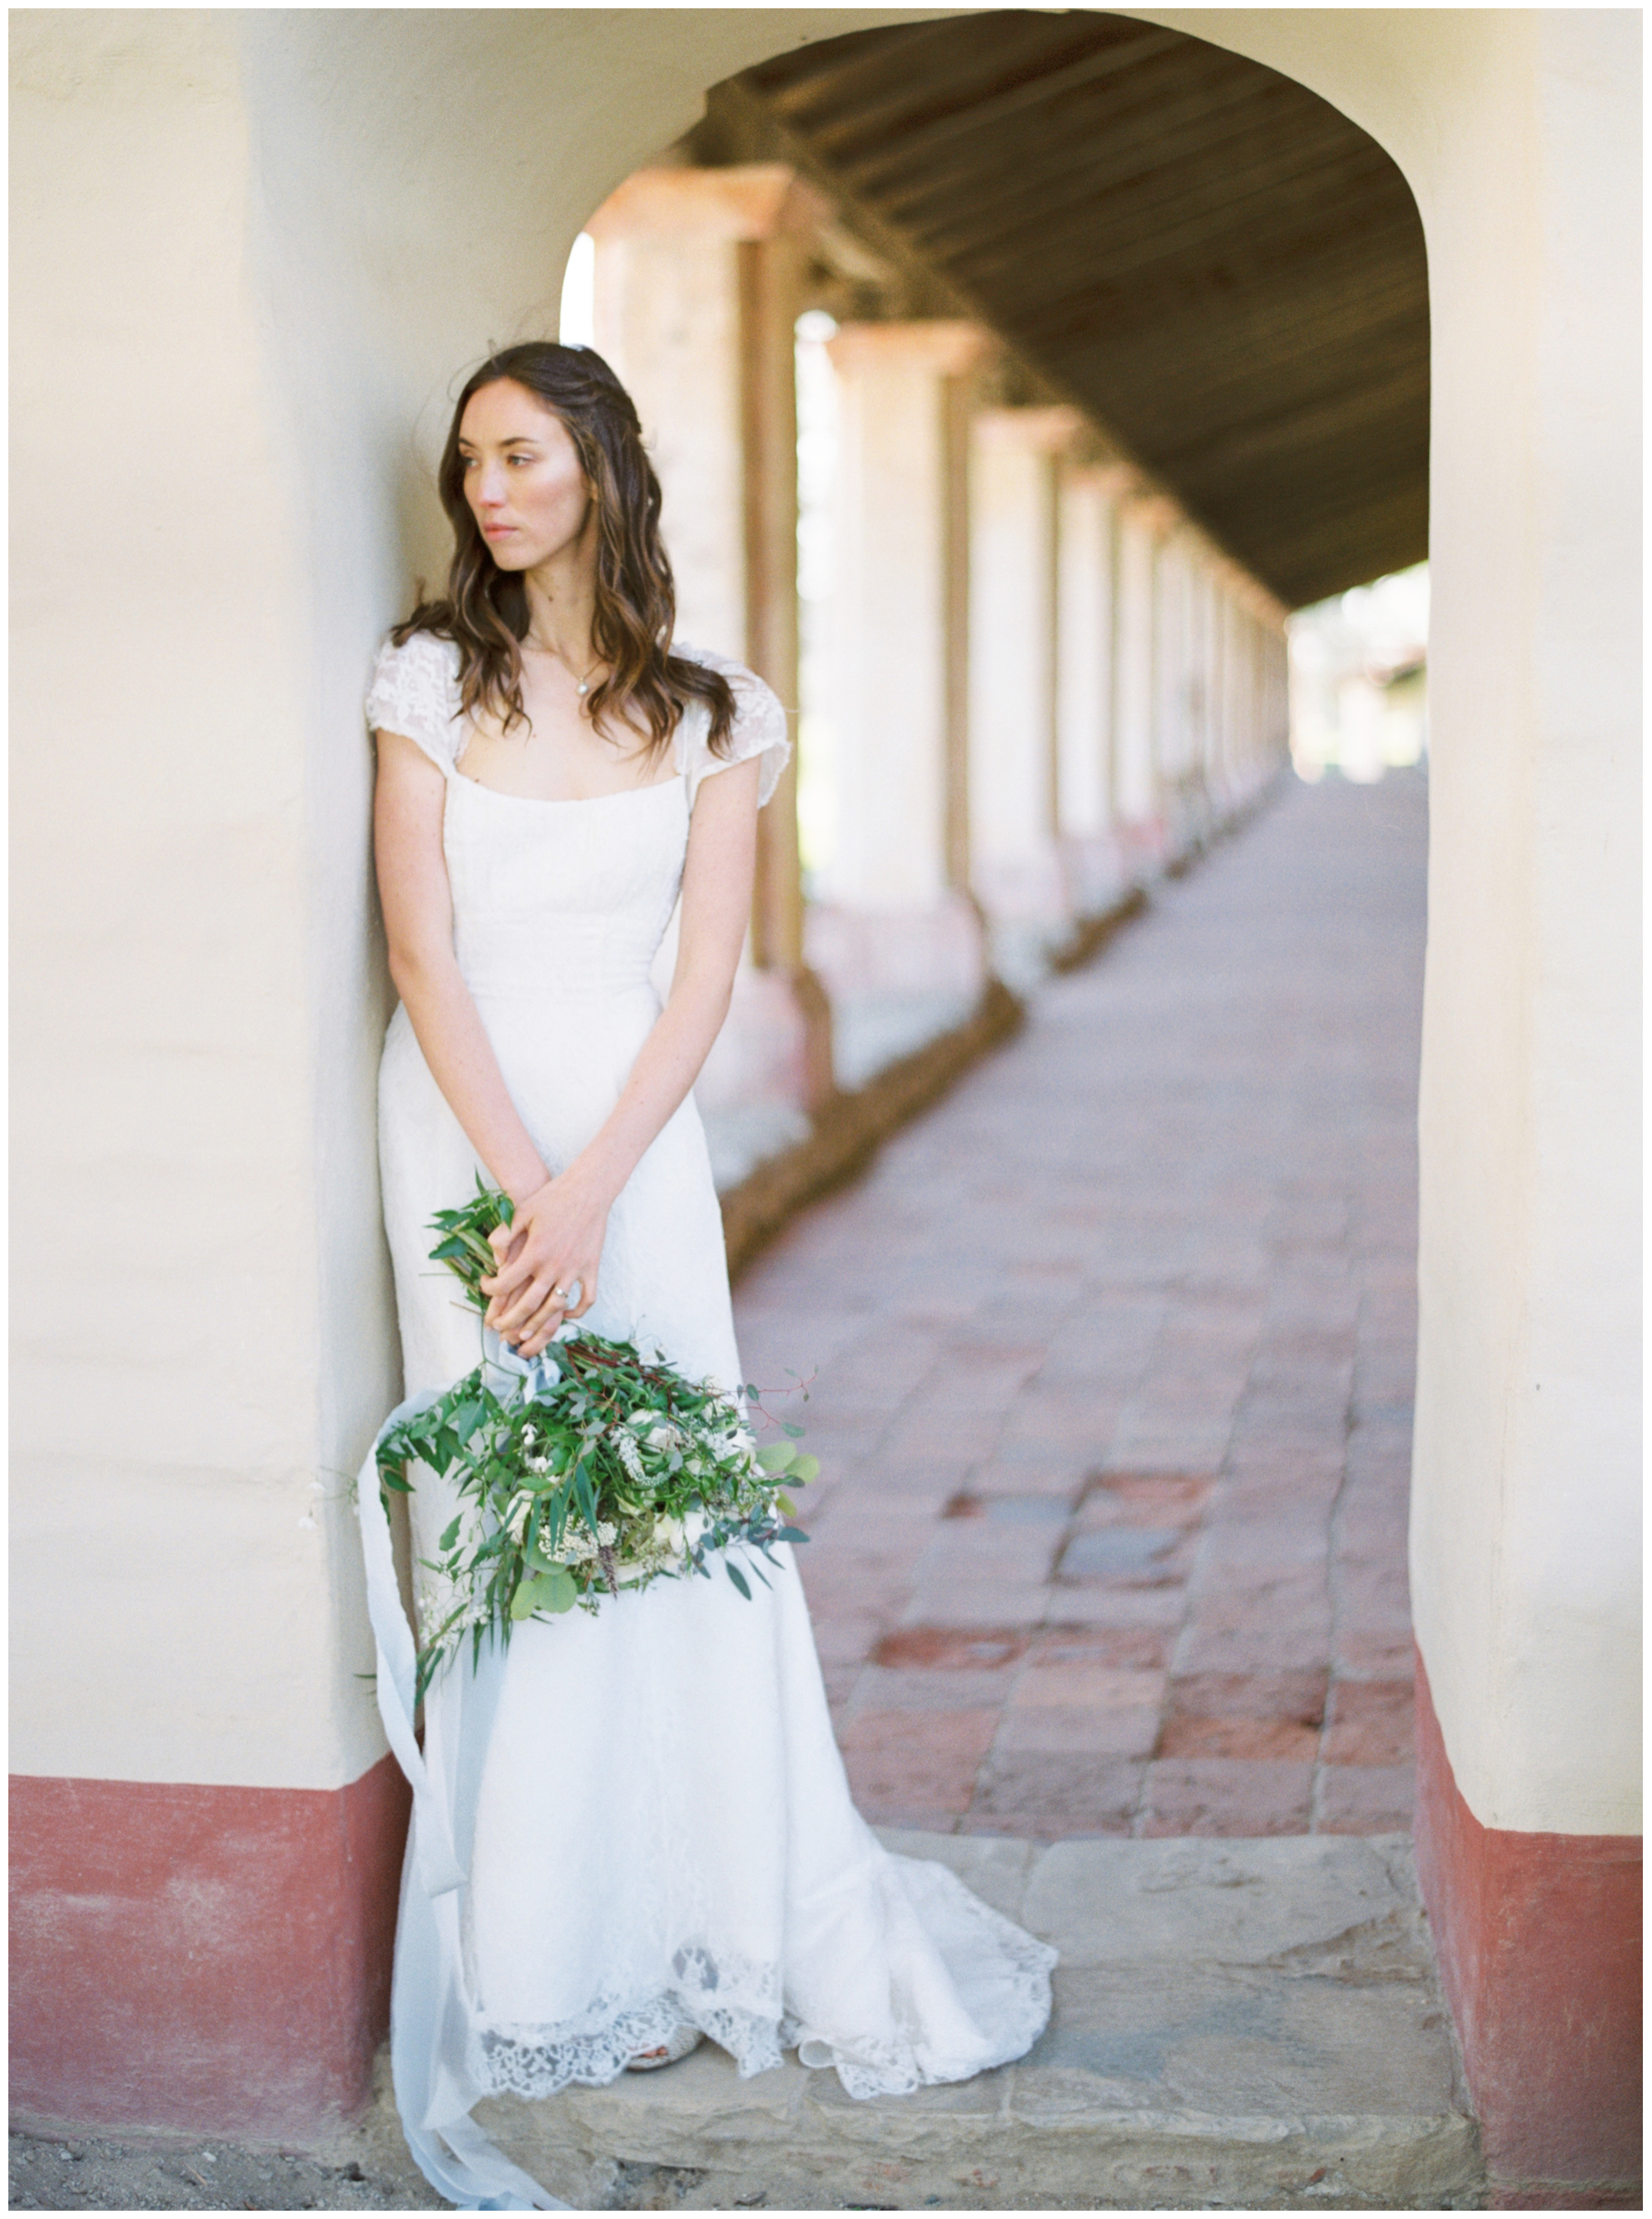 Los_Angeles_Wedding_Photographer_Pinnel_Photography_La_Purisima-8.jpg